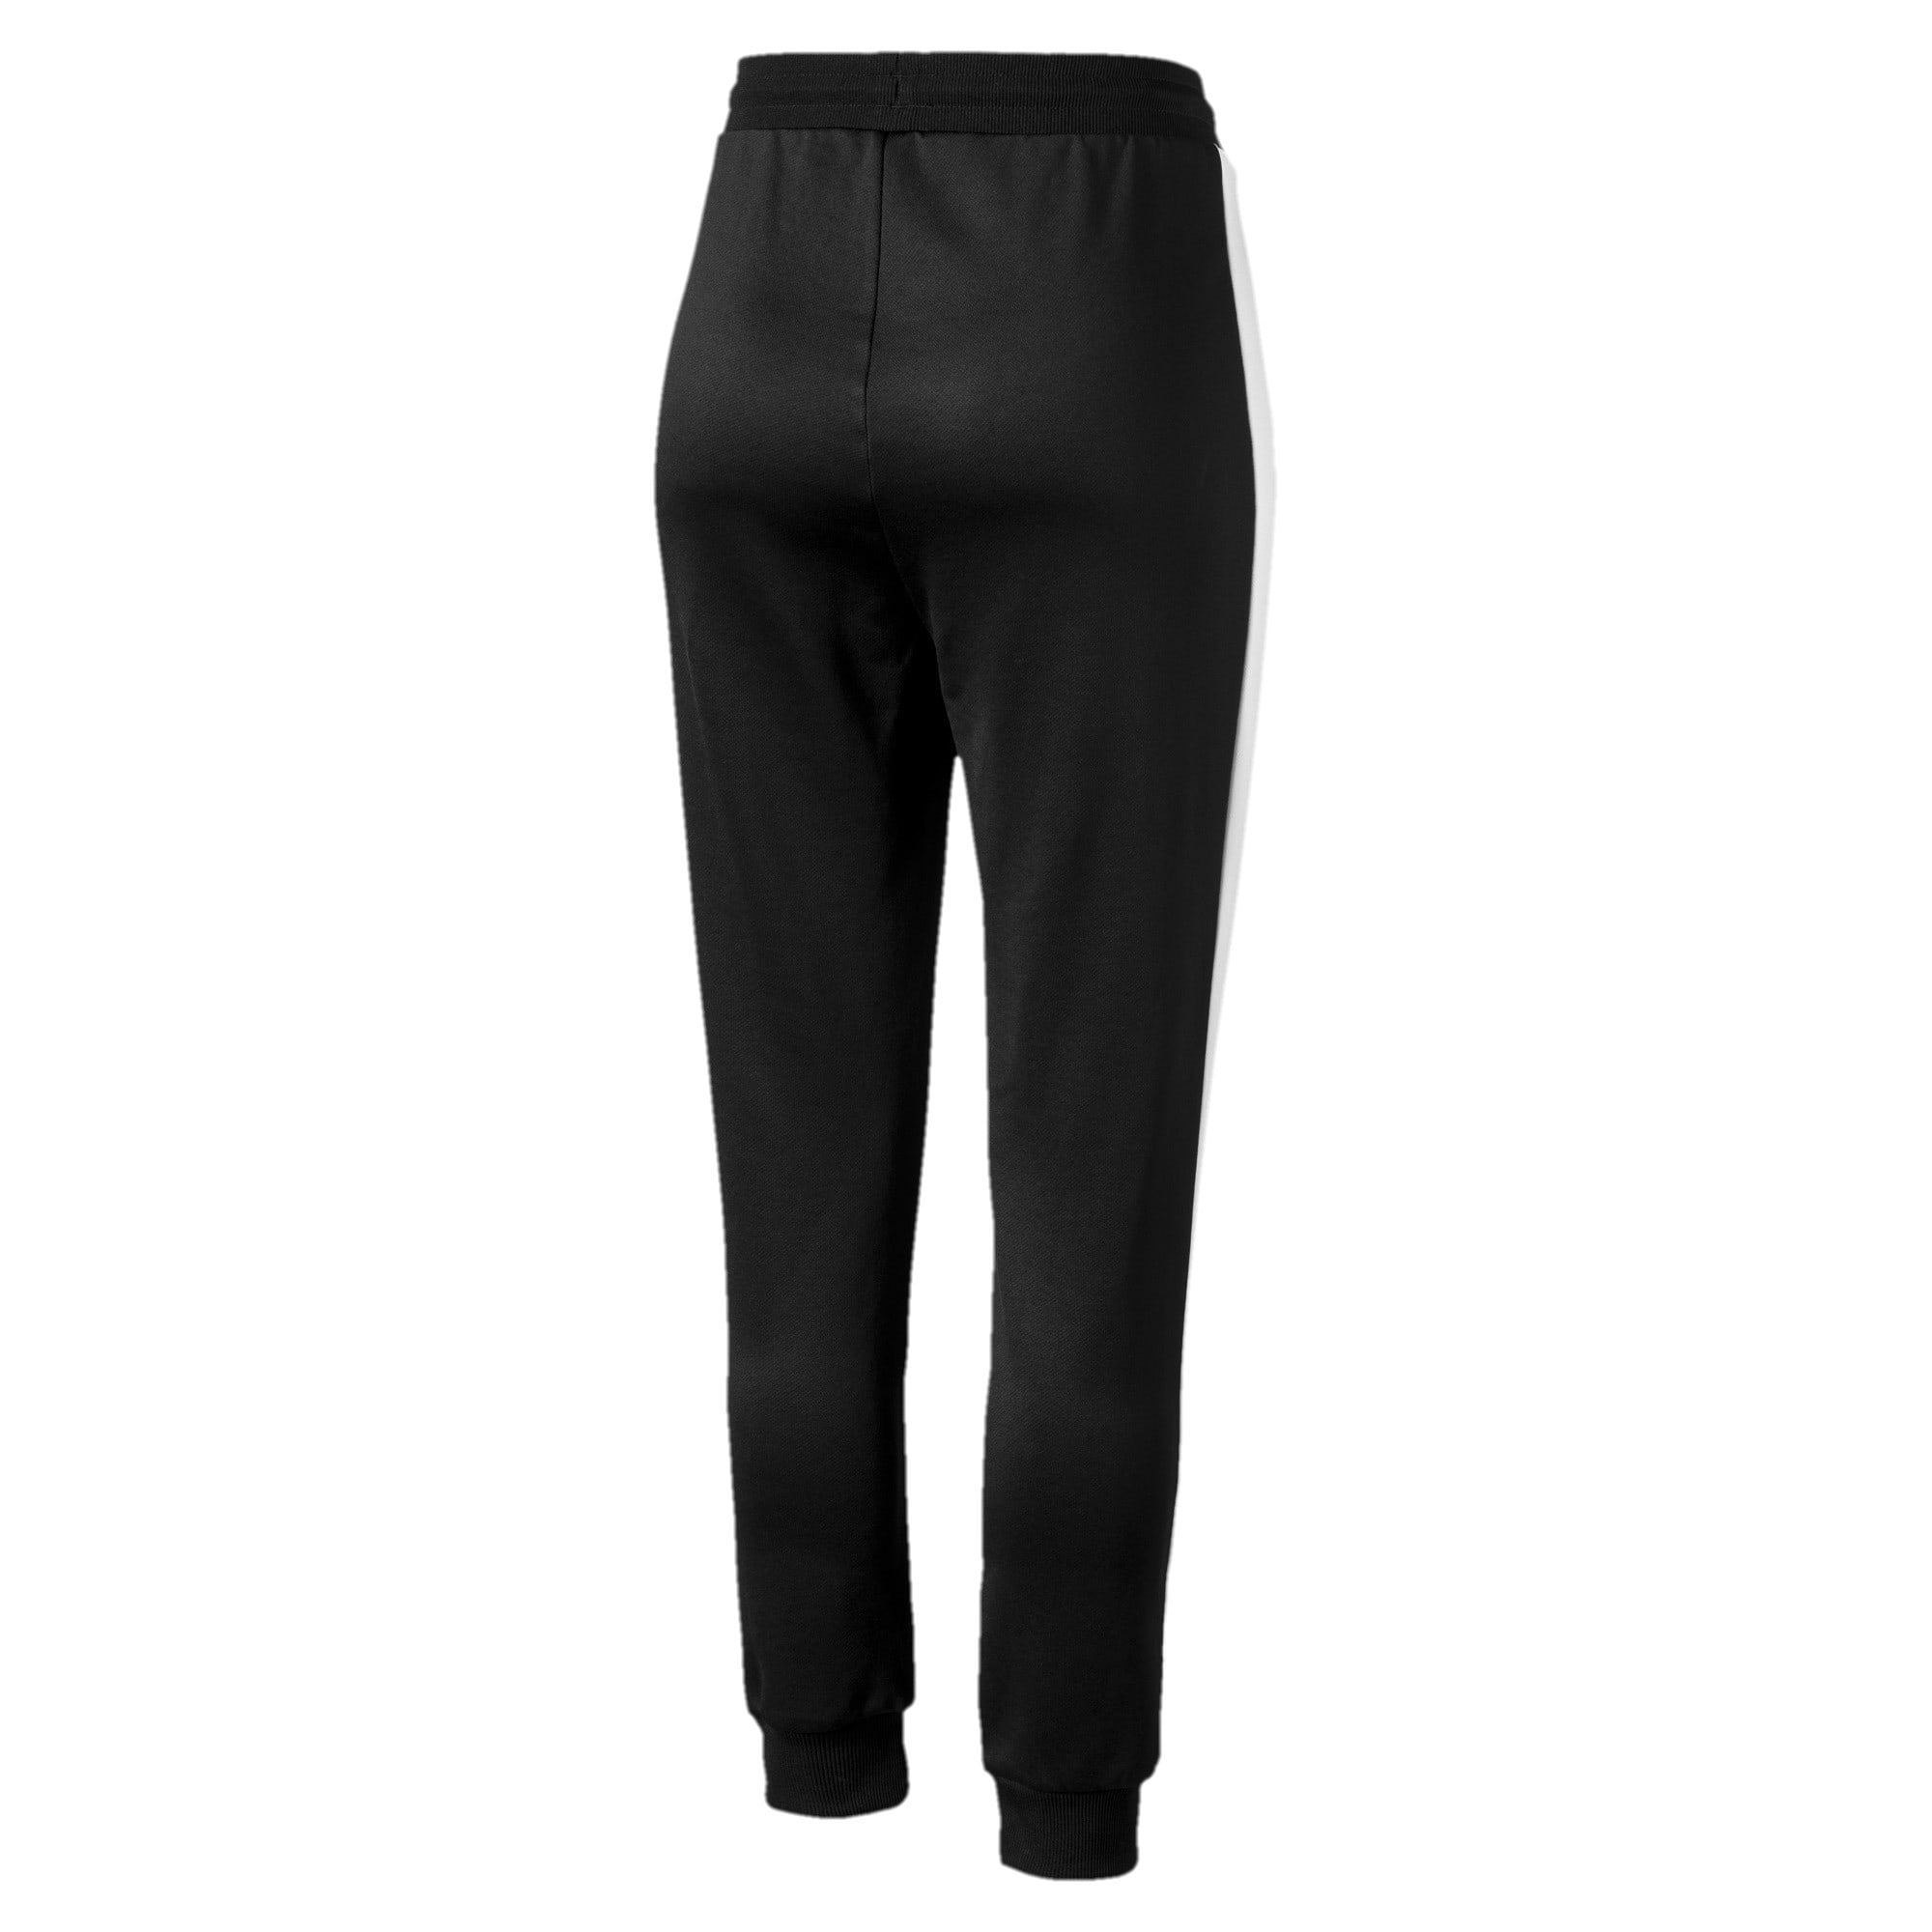 Thumbnail 5 of Classics T7 Knitted Women's Track Pants, Puma Black, medium